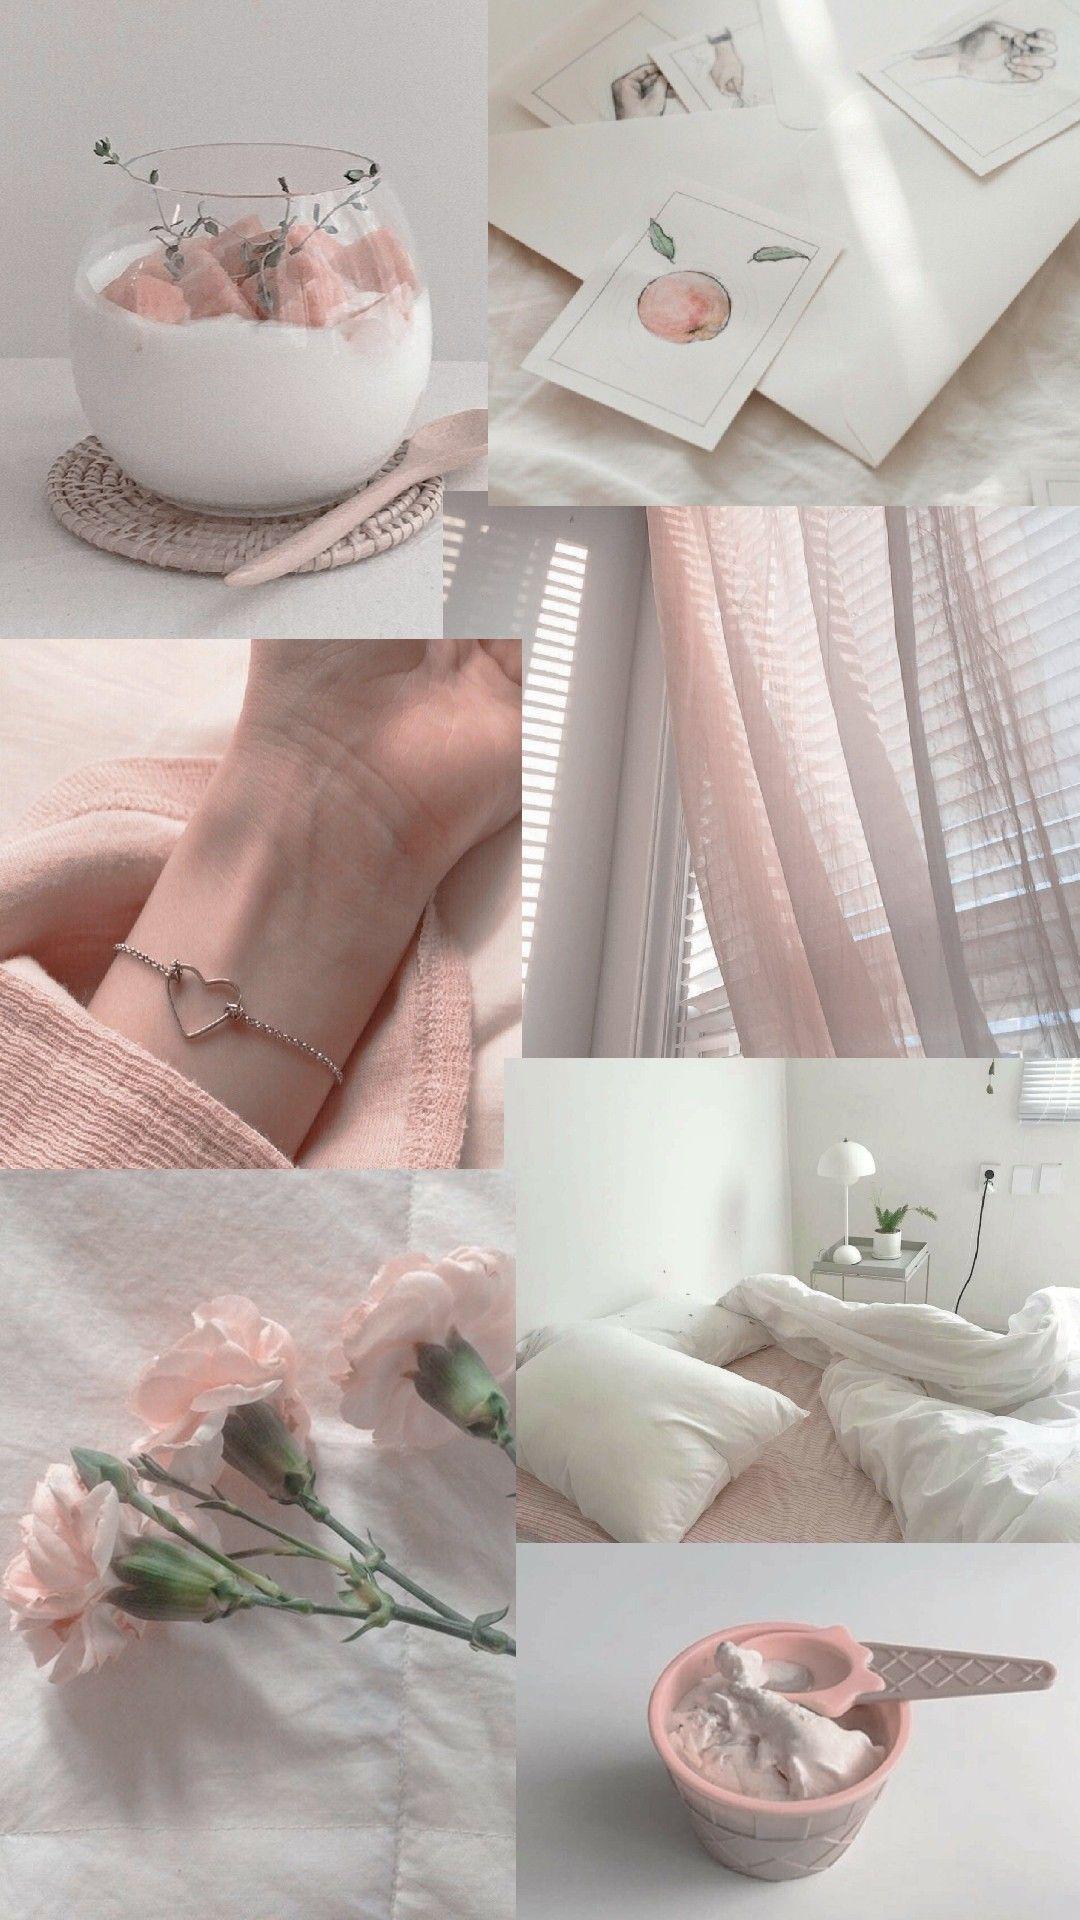 Aesthetic Wallpaper Pink Ideias De Fotos Ideias Ballet